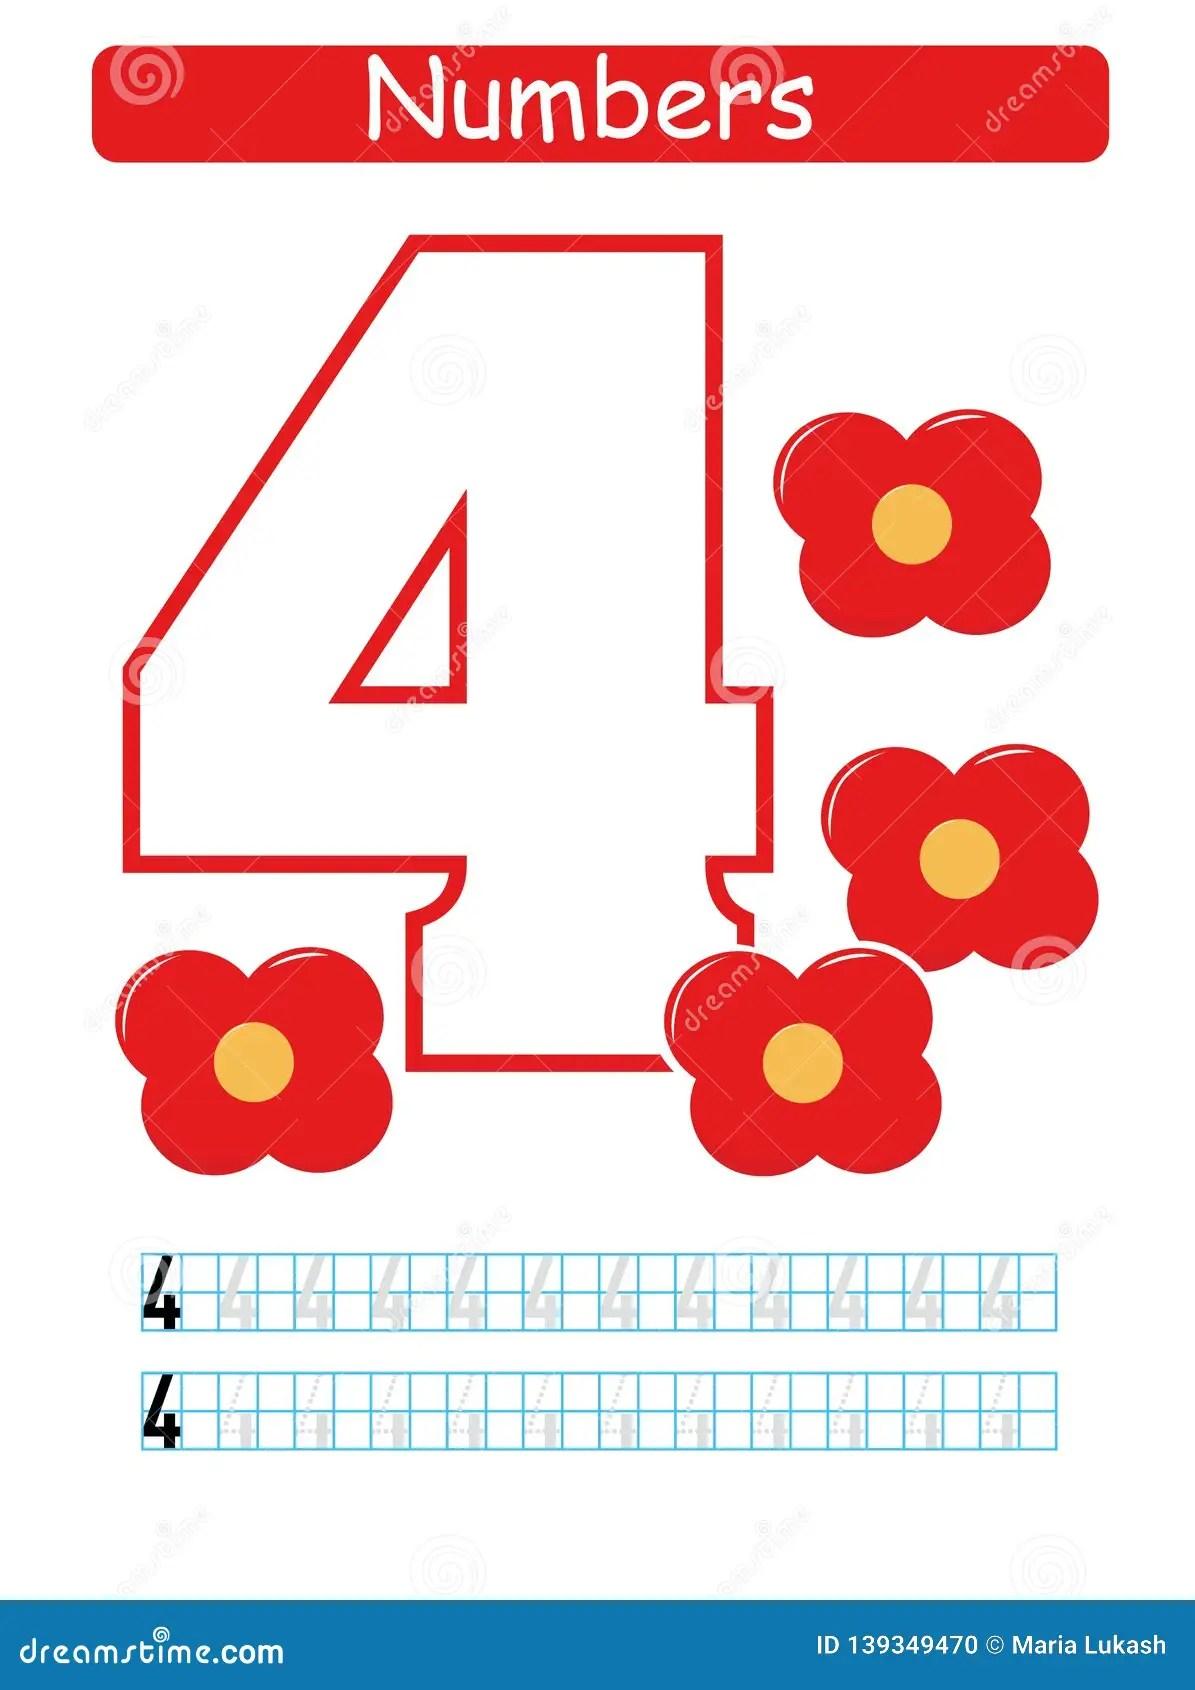 Coloring Printable Worksheet For Kindergarten And